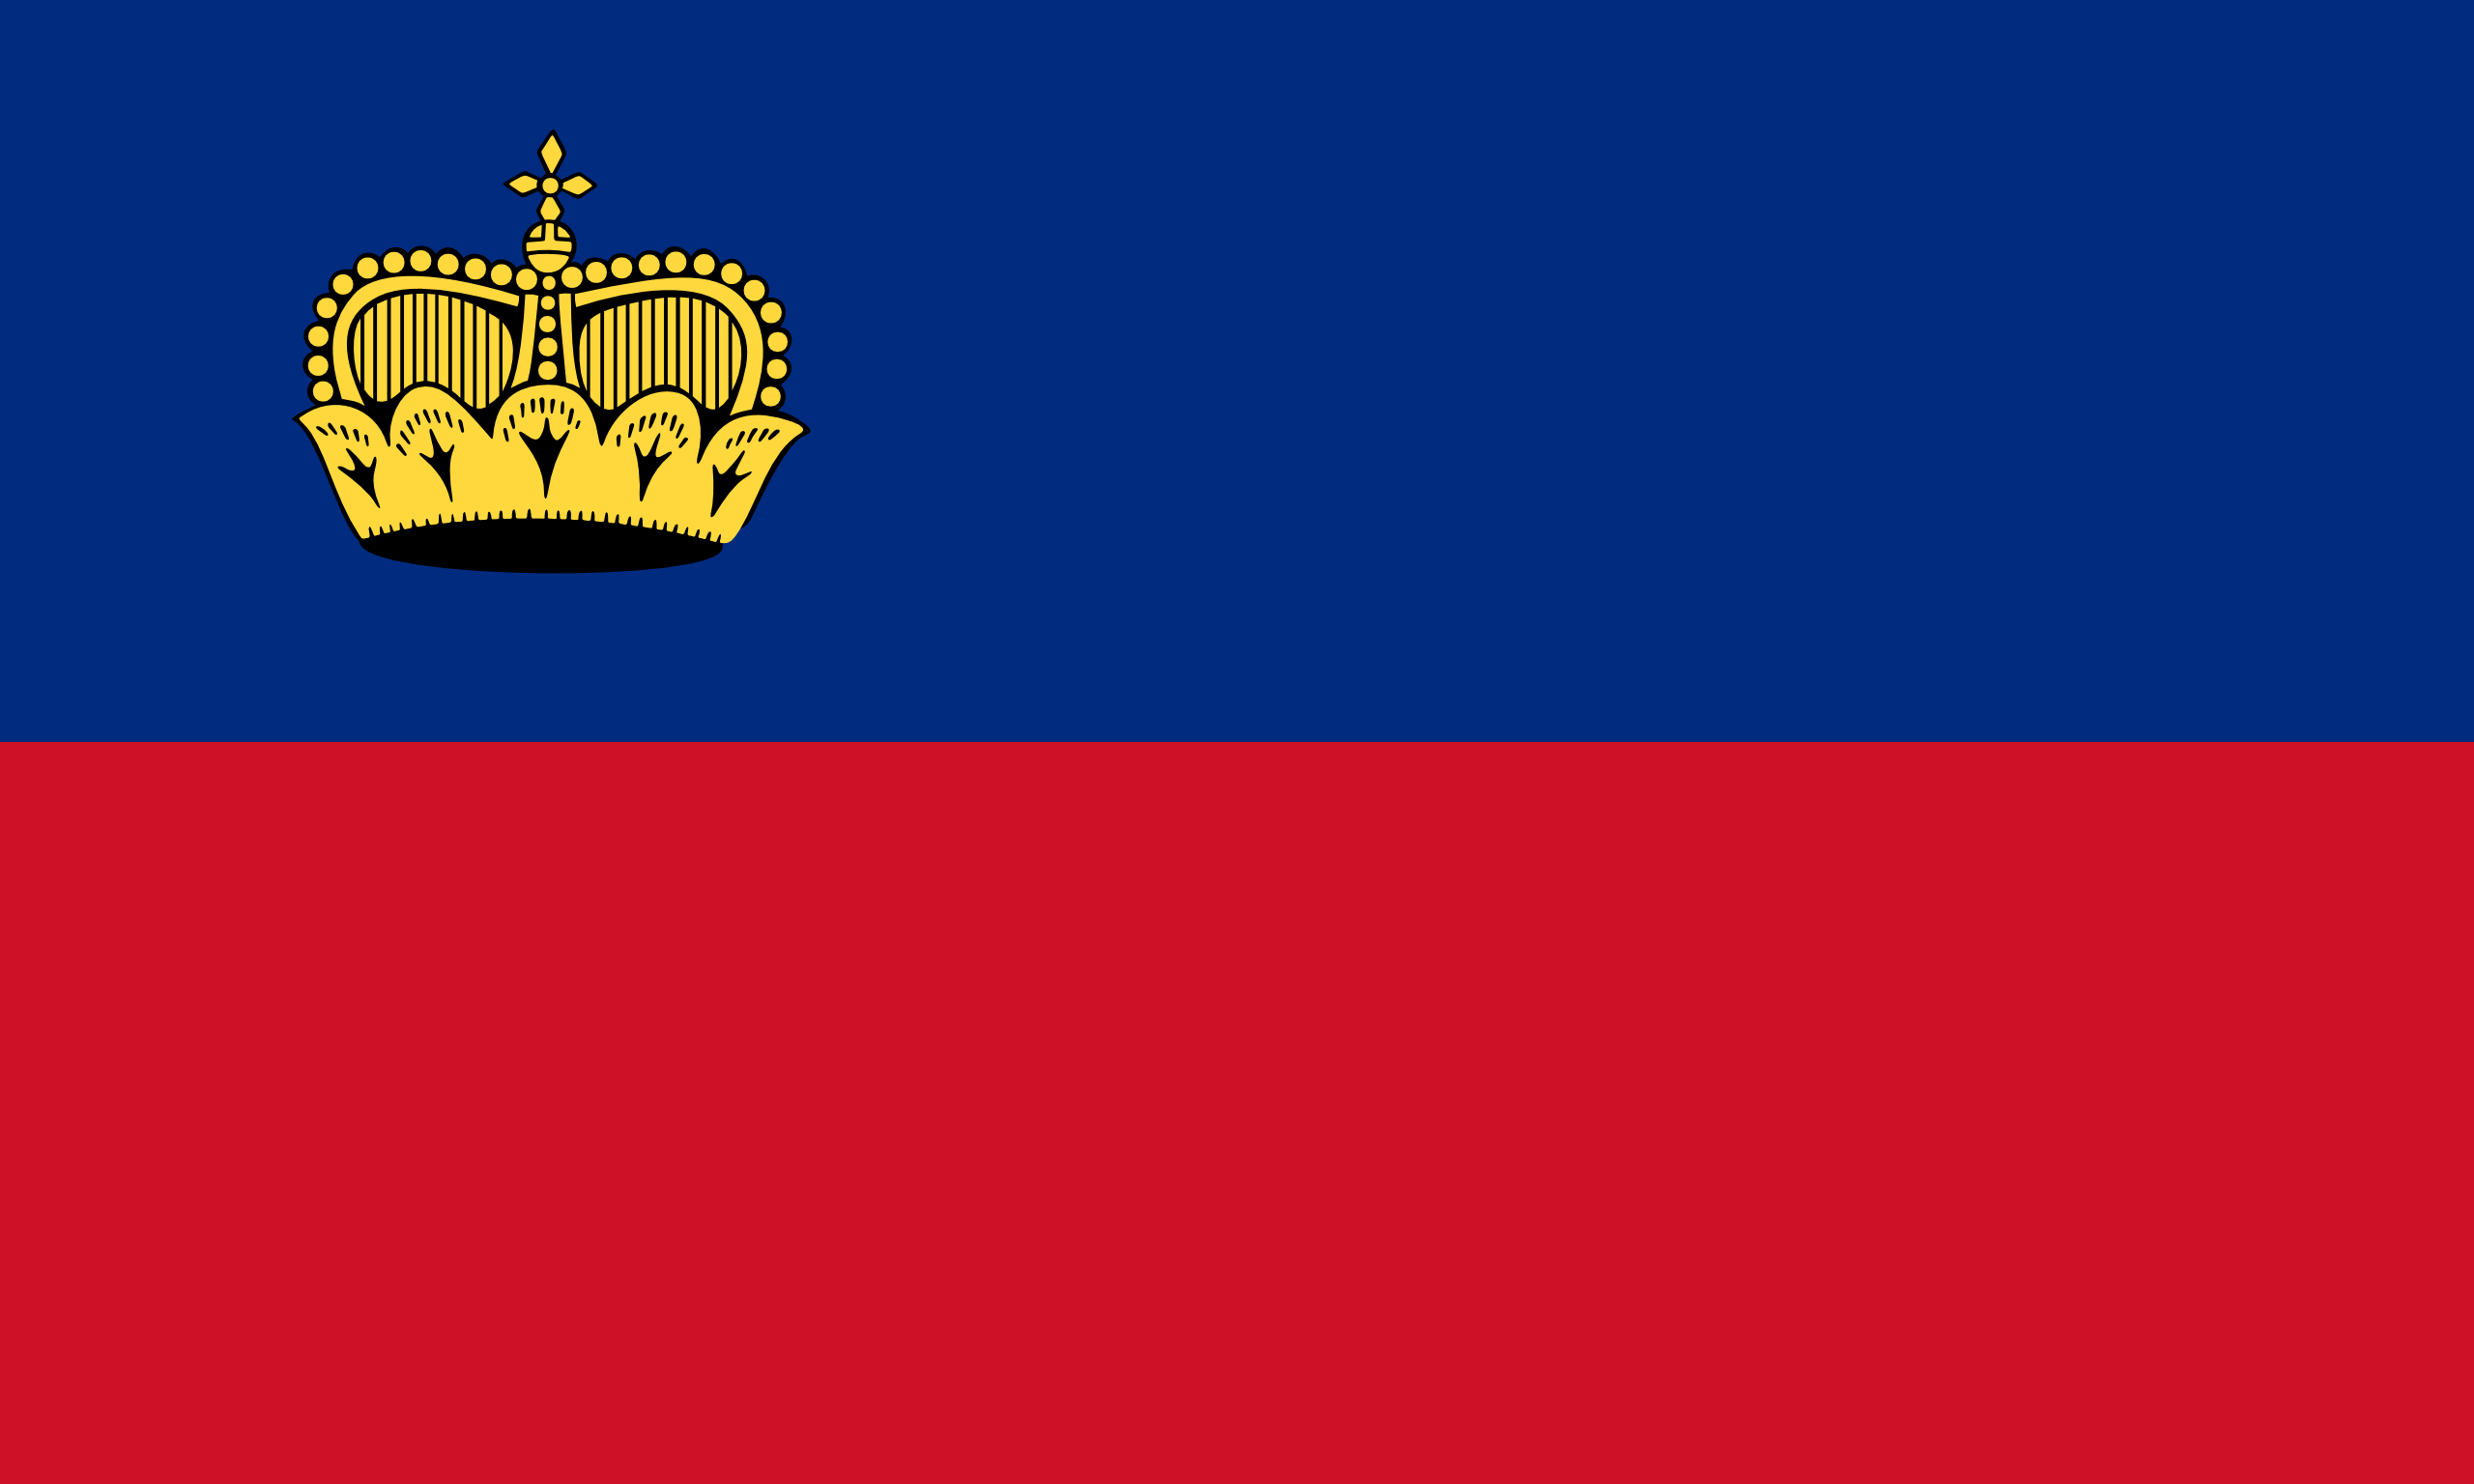 Лихтенштейн, страна, Эмблема, логотип, символ - Обои HD - Профессор falken.com